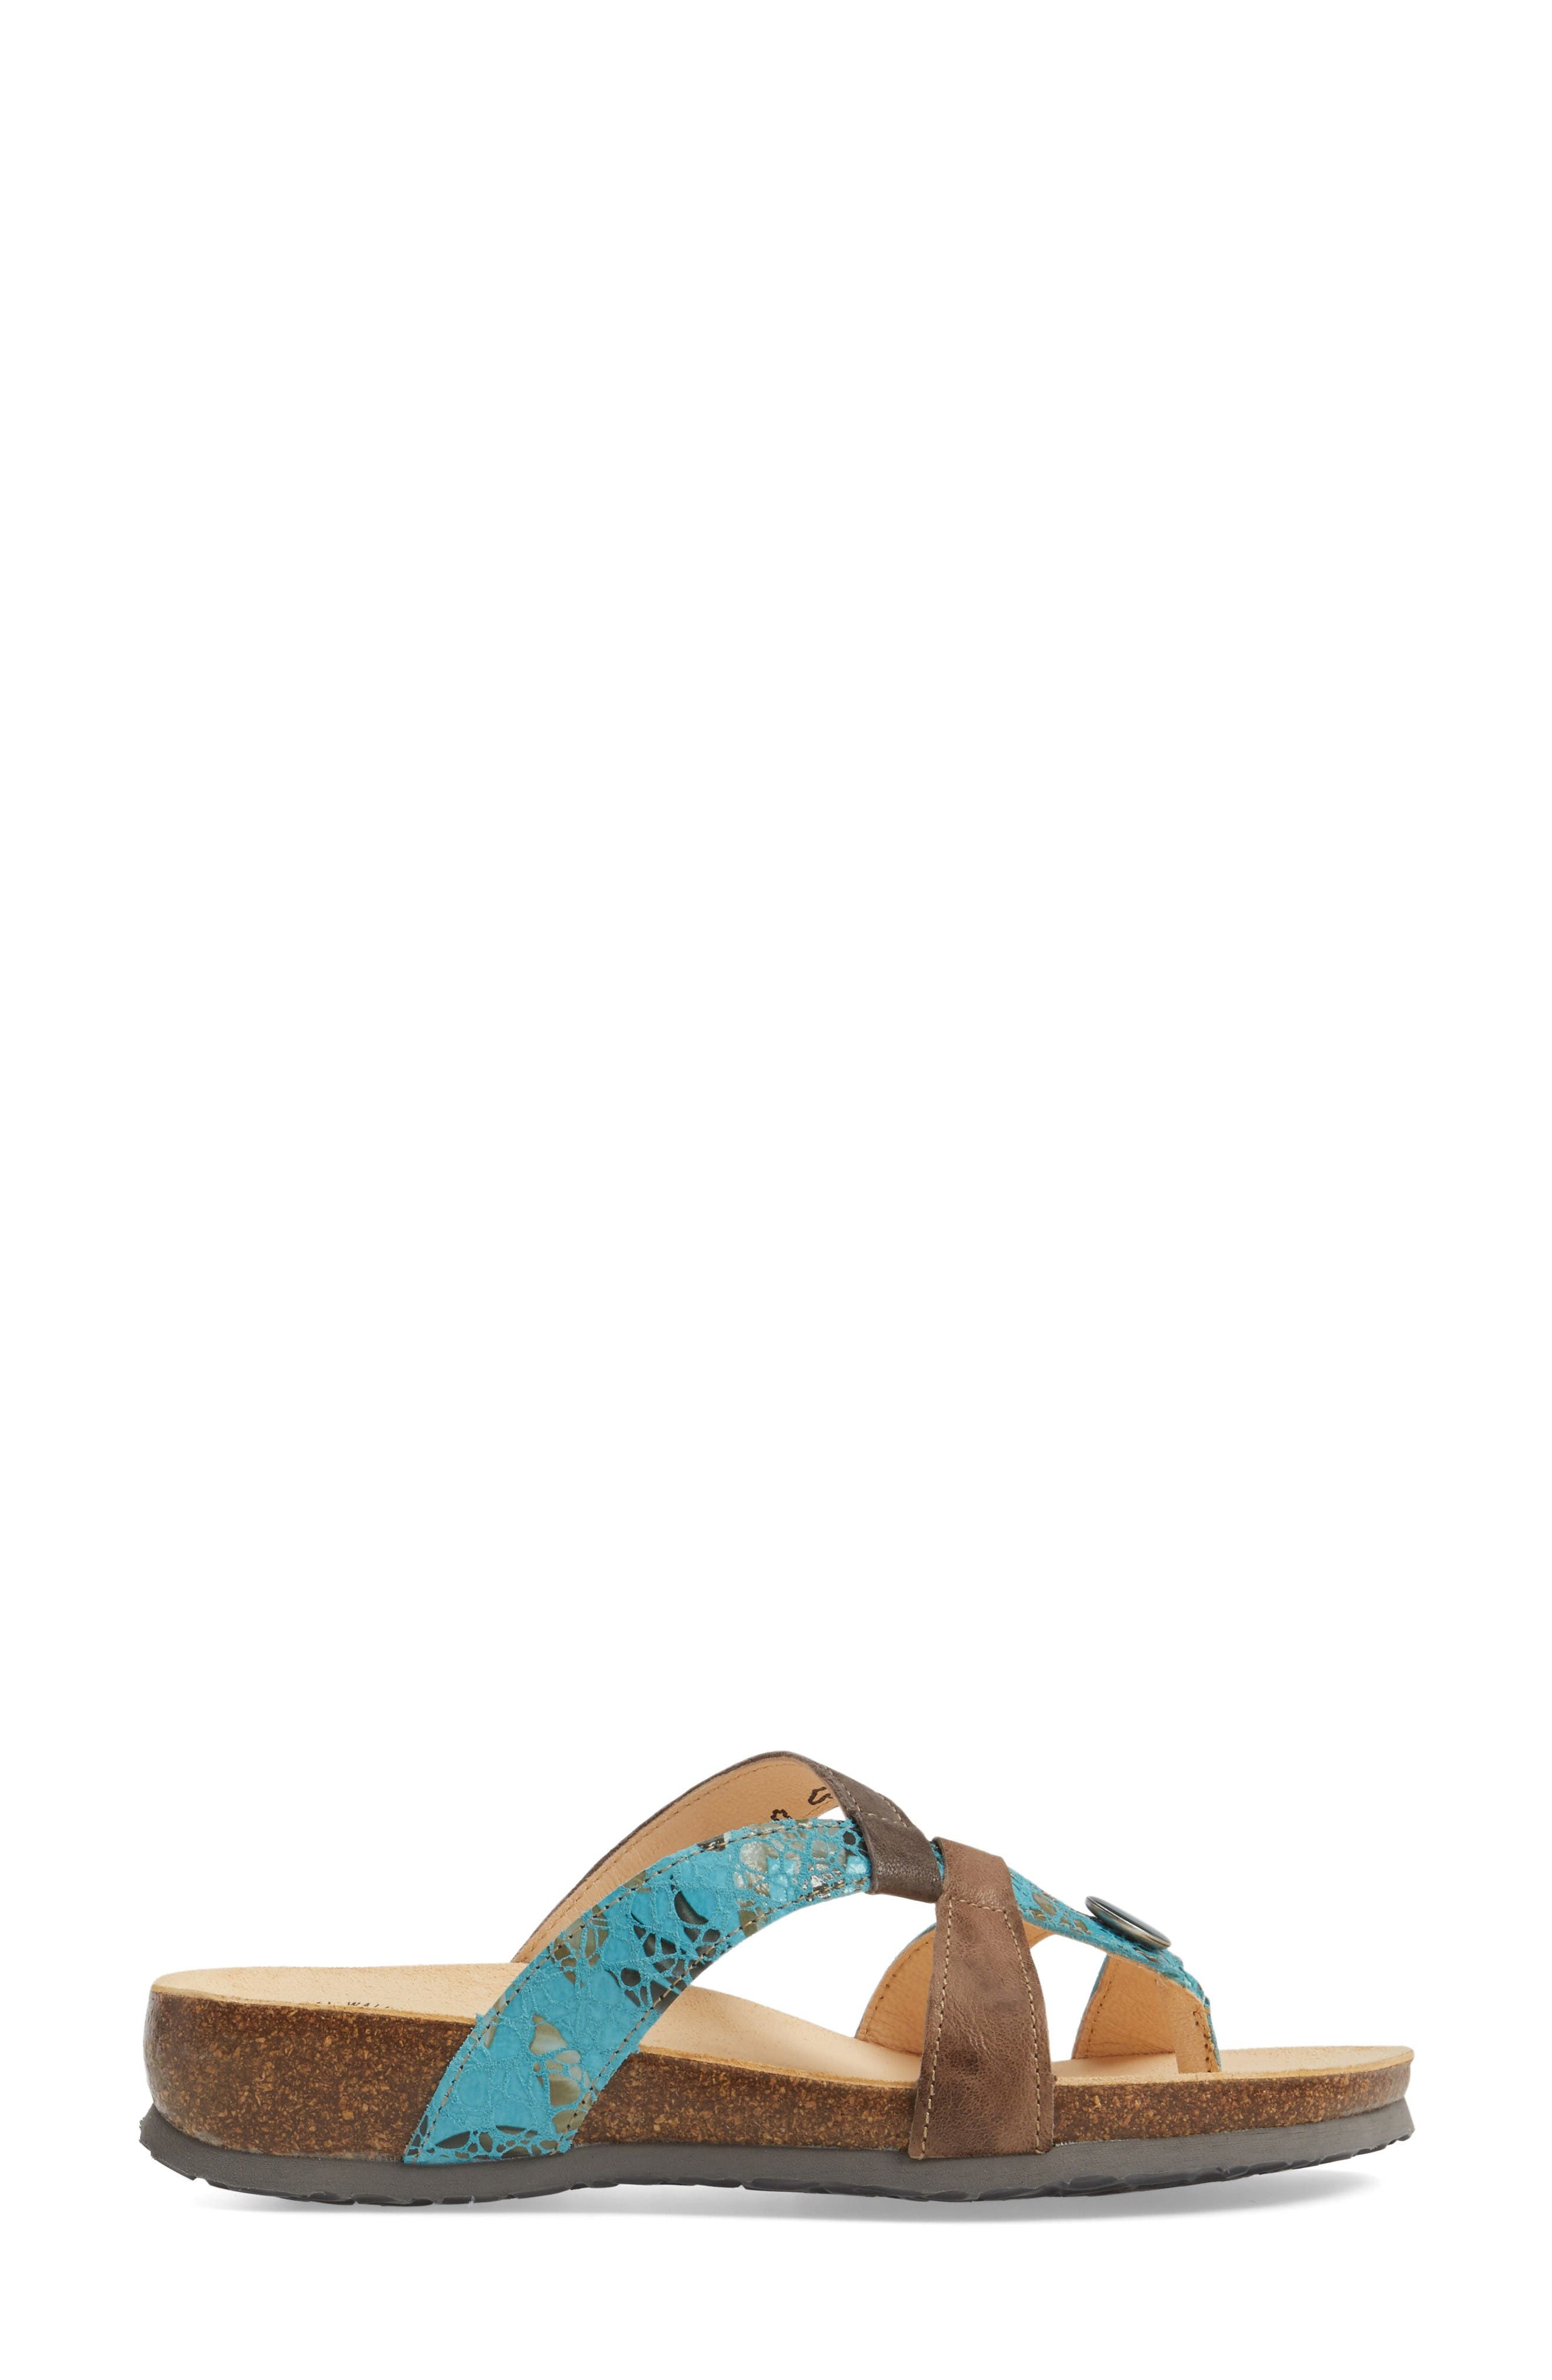 Alternate Image 3  - Think! 'Julia Strappy' Sandal